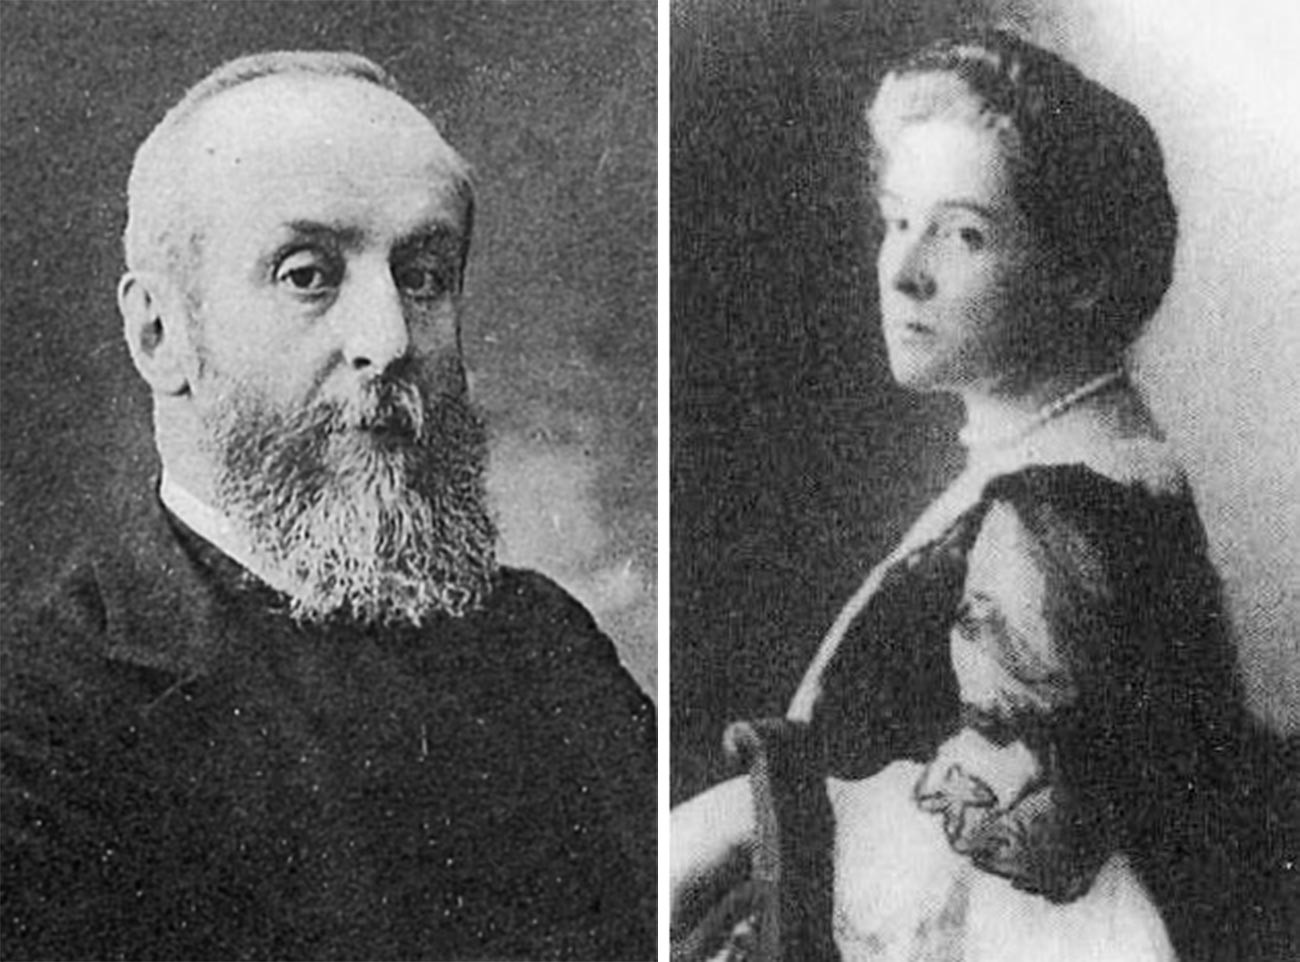 À  gauche - Alexeï Bobrinski, à droite - la comtesse Nadejda Bobrinskaïa